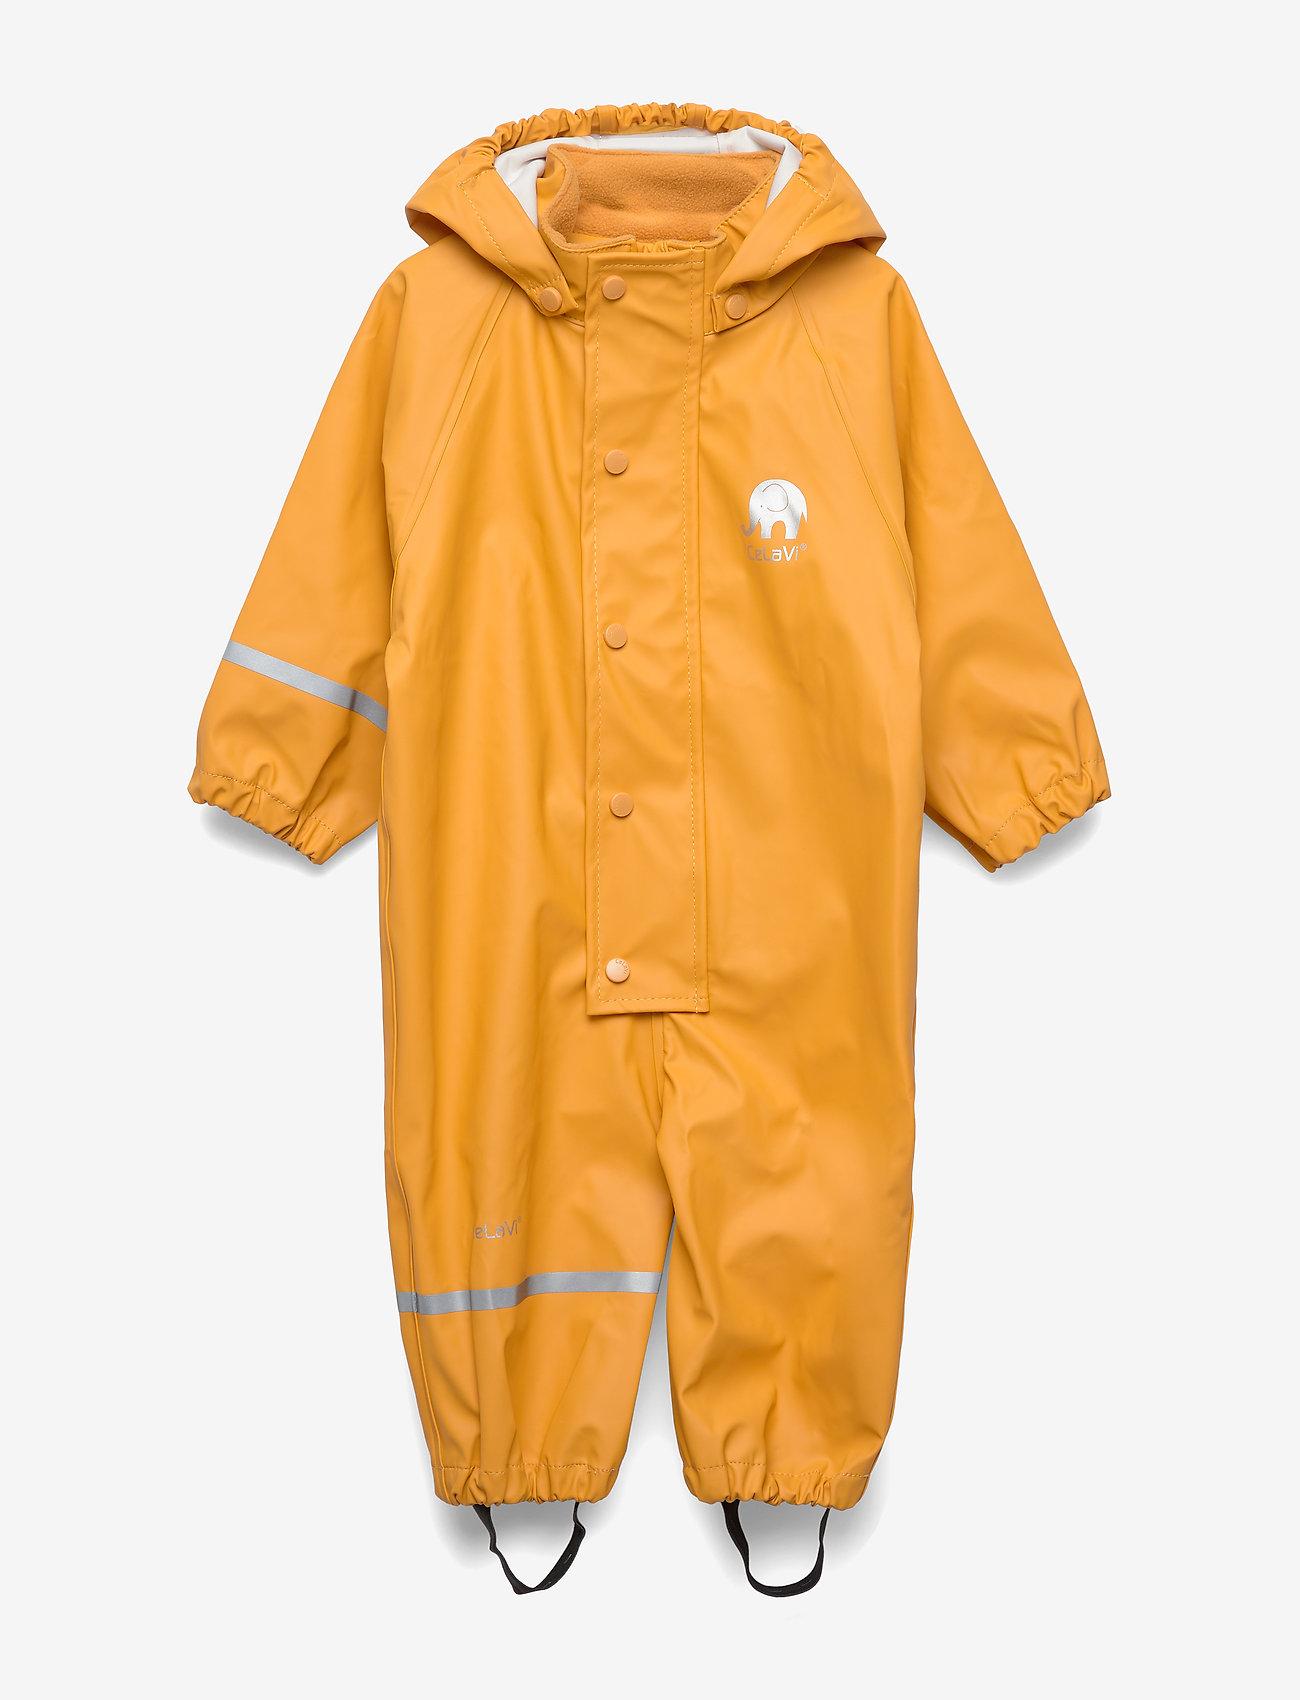 CeLaVi - Rainwear suit -PU - ensembles - mineral yellow - 0